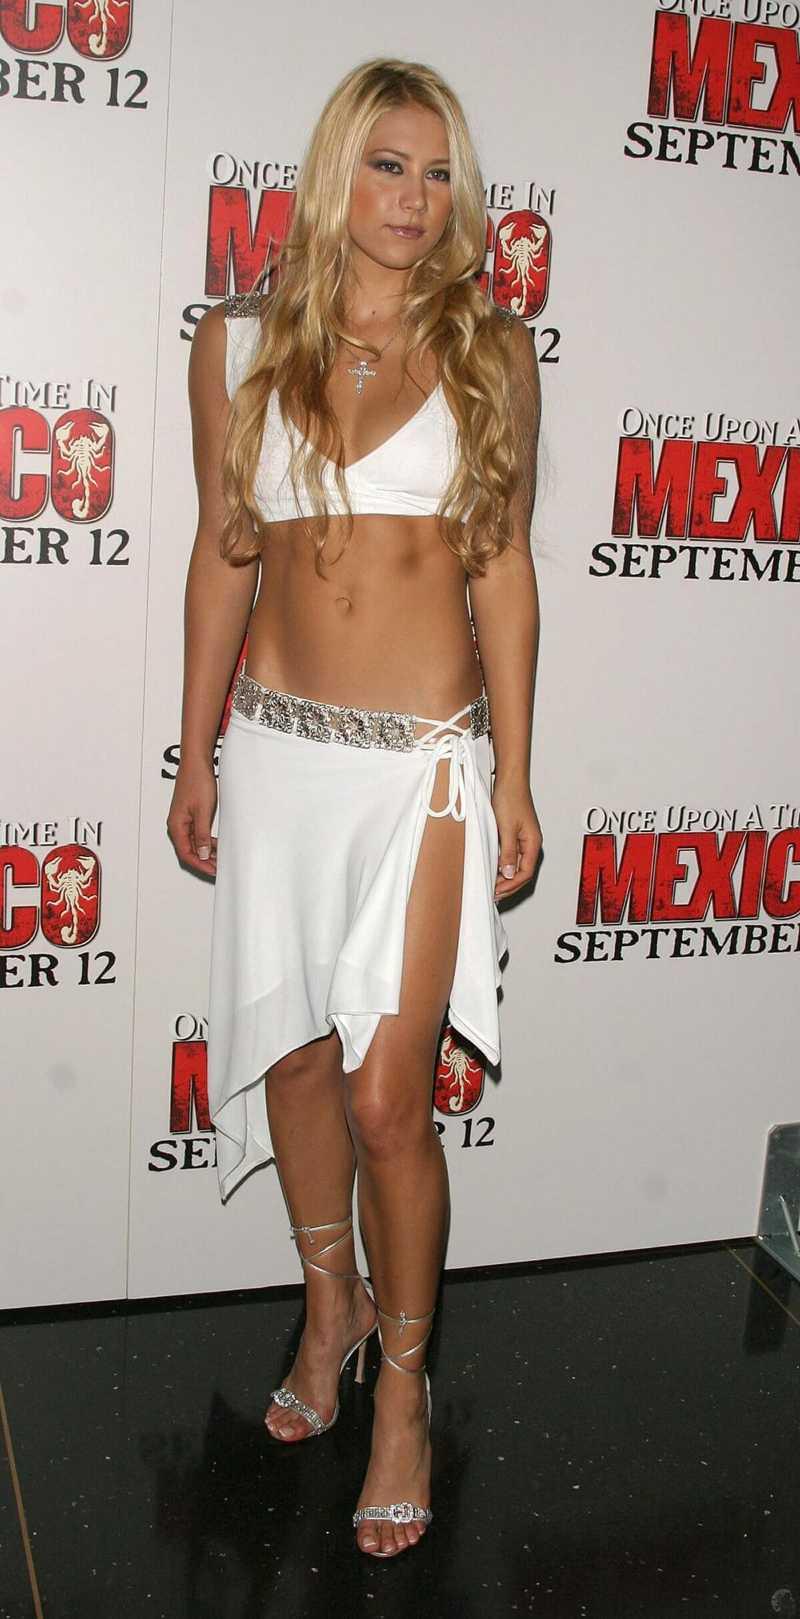 Anna-Kournikova-sexy-navel-show-in-bikini-top-and-slit-outfit